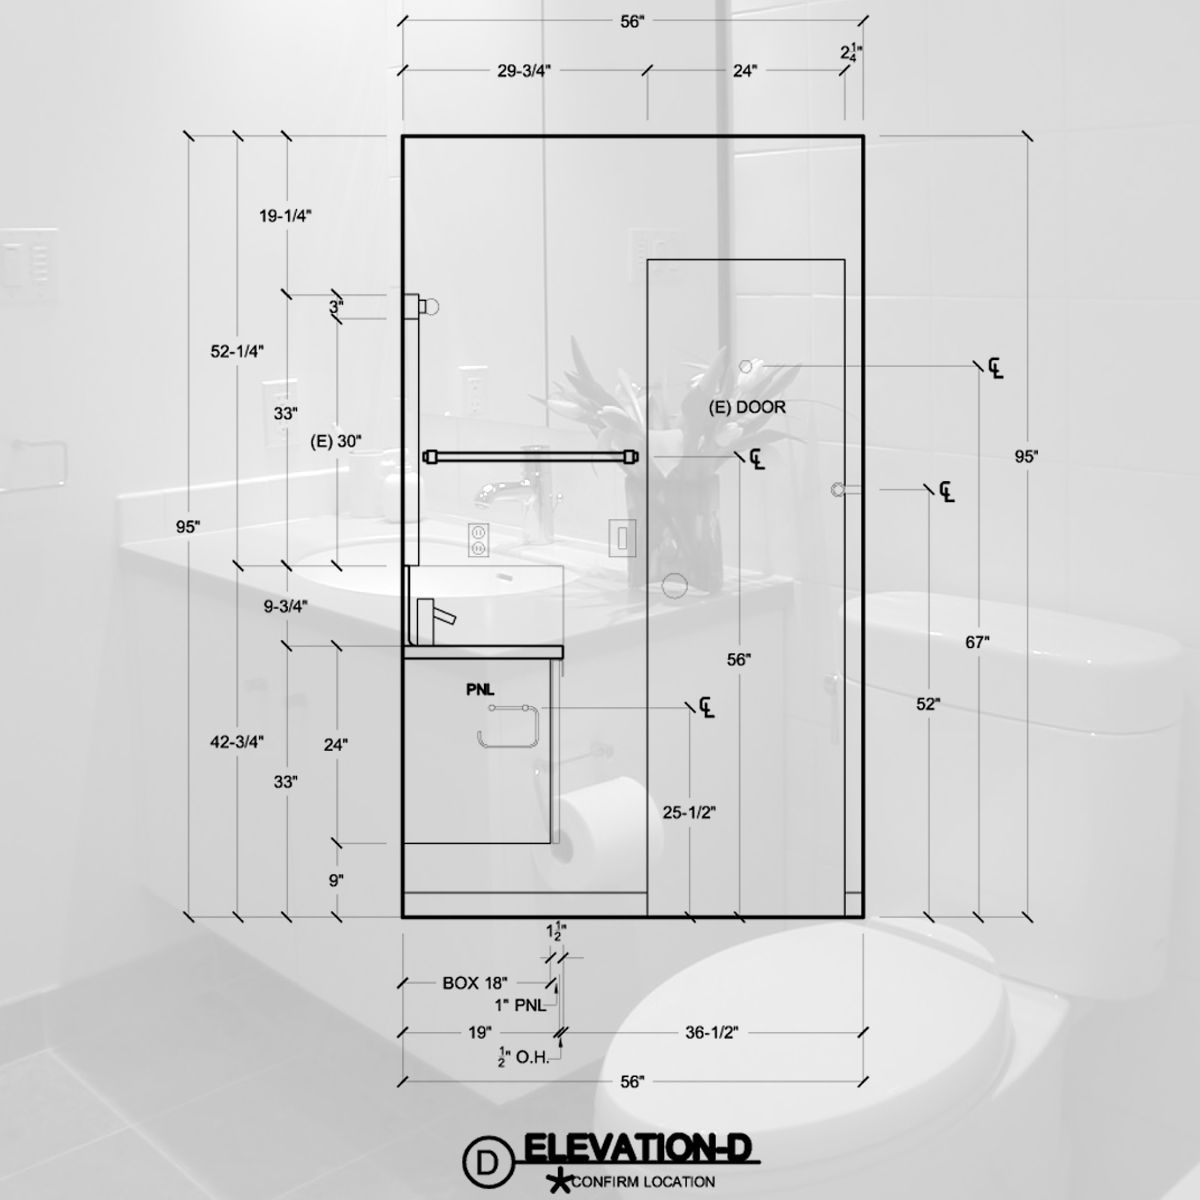 Bathroom Floor Plans X Bathroom Design Pinterest - 5 x 9 bathroom remodel